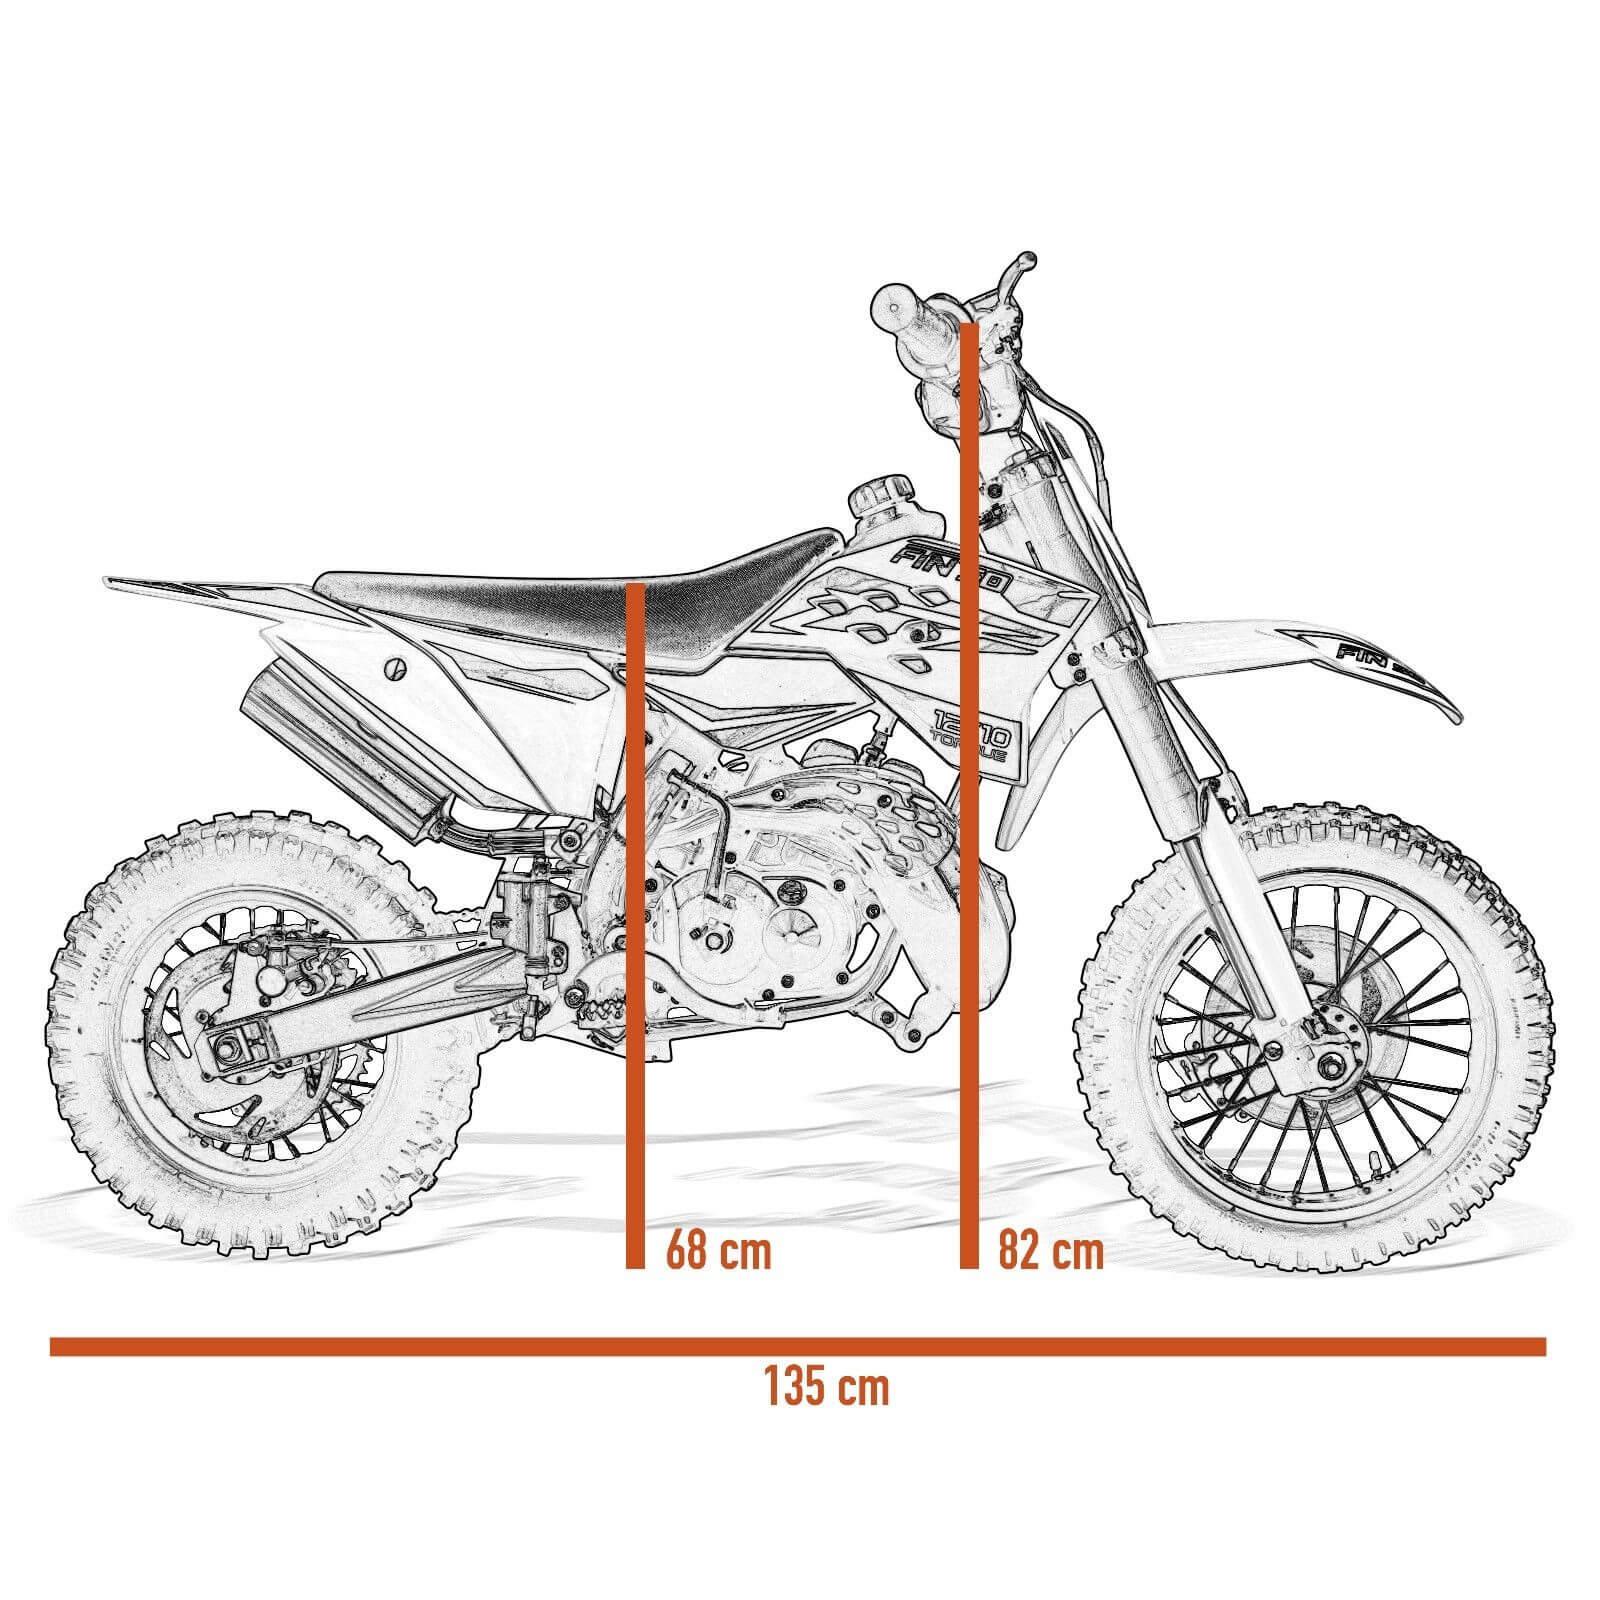 2 Stroke 50cc Dirt Bike 12 10 Wheels Hydraulic Front And